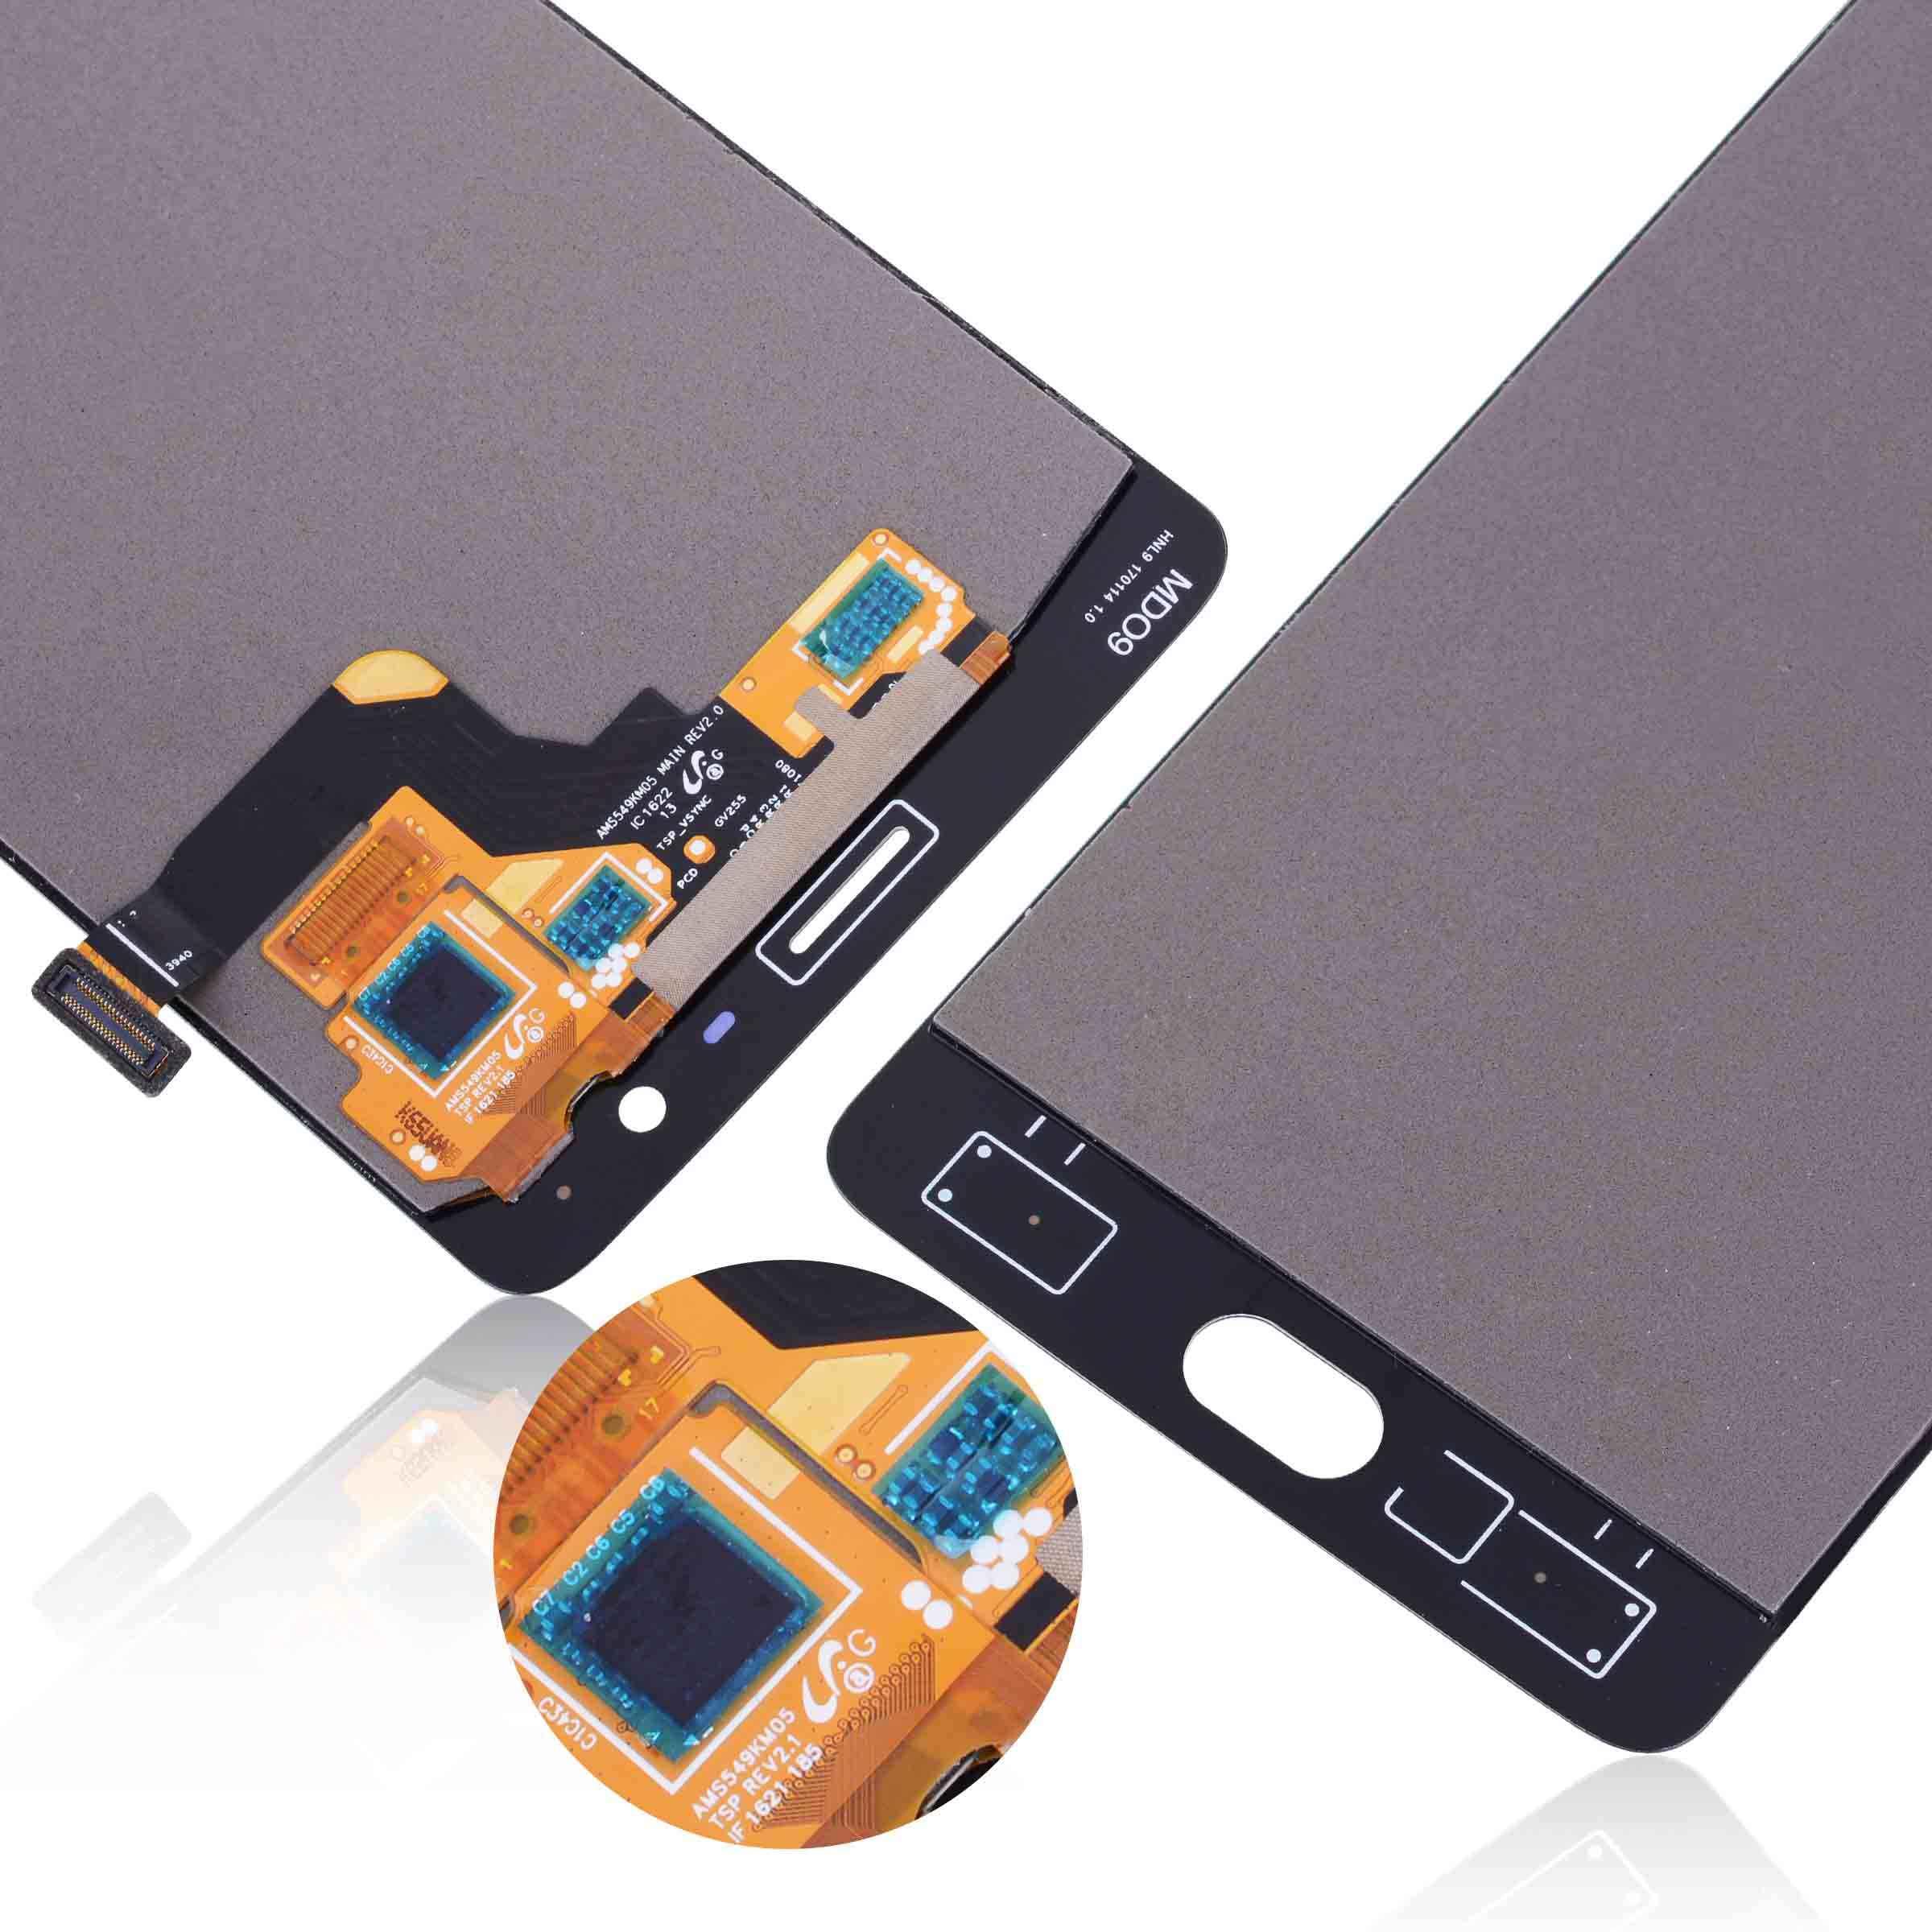 AMOLED العرض الأصلي ل Oneplus 3t عرض LCD تعمل باللمس مع الإطار استبدال ل Oneplus 3 عرض 3t LCD A3000 A3003